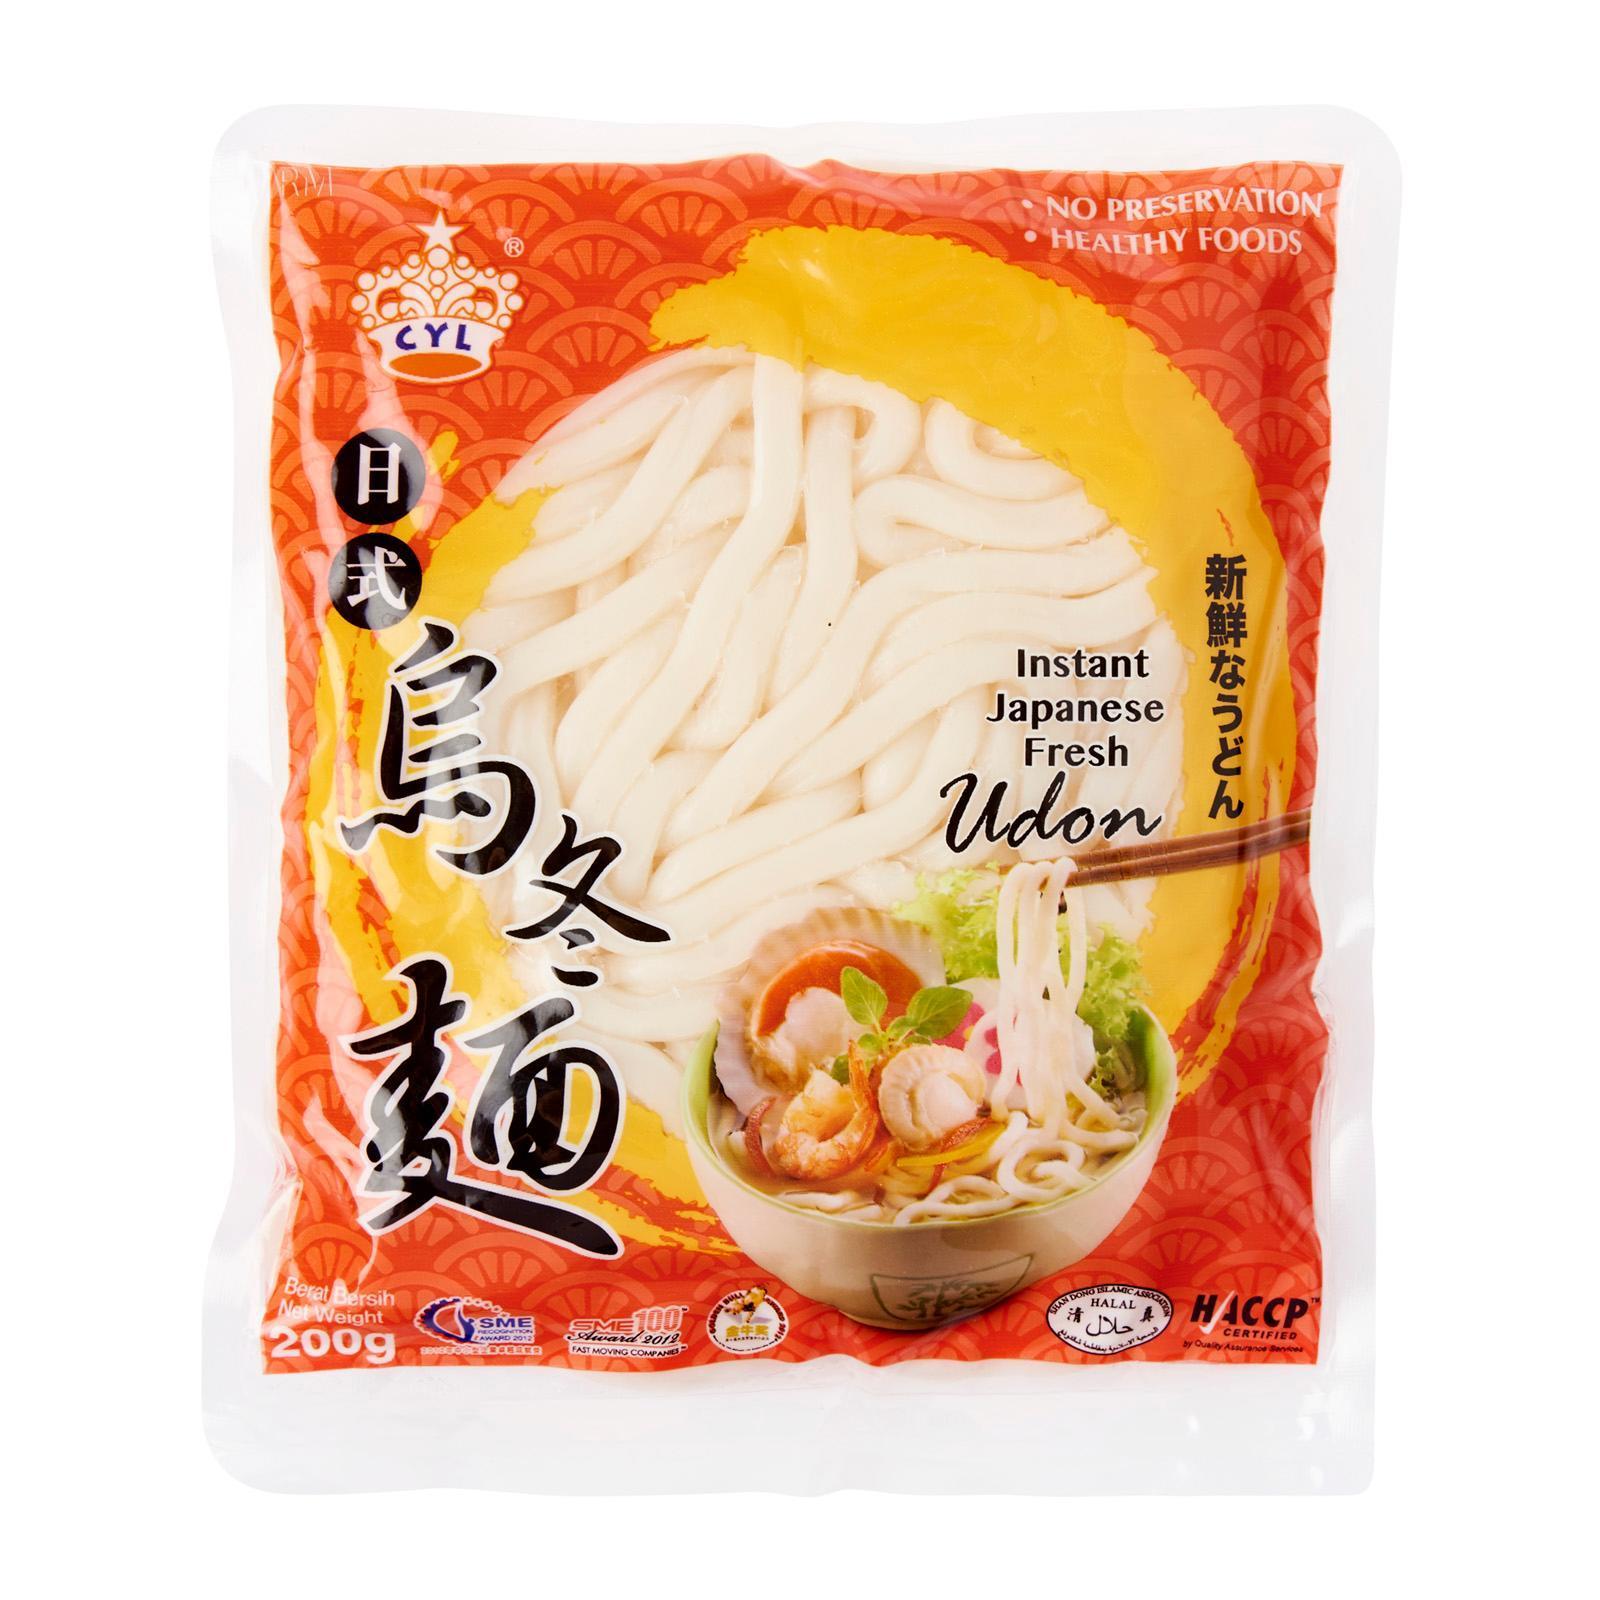 CB Instant Japanese Fresh Udon